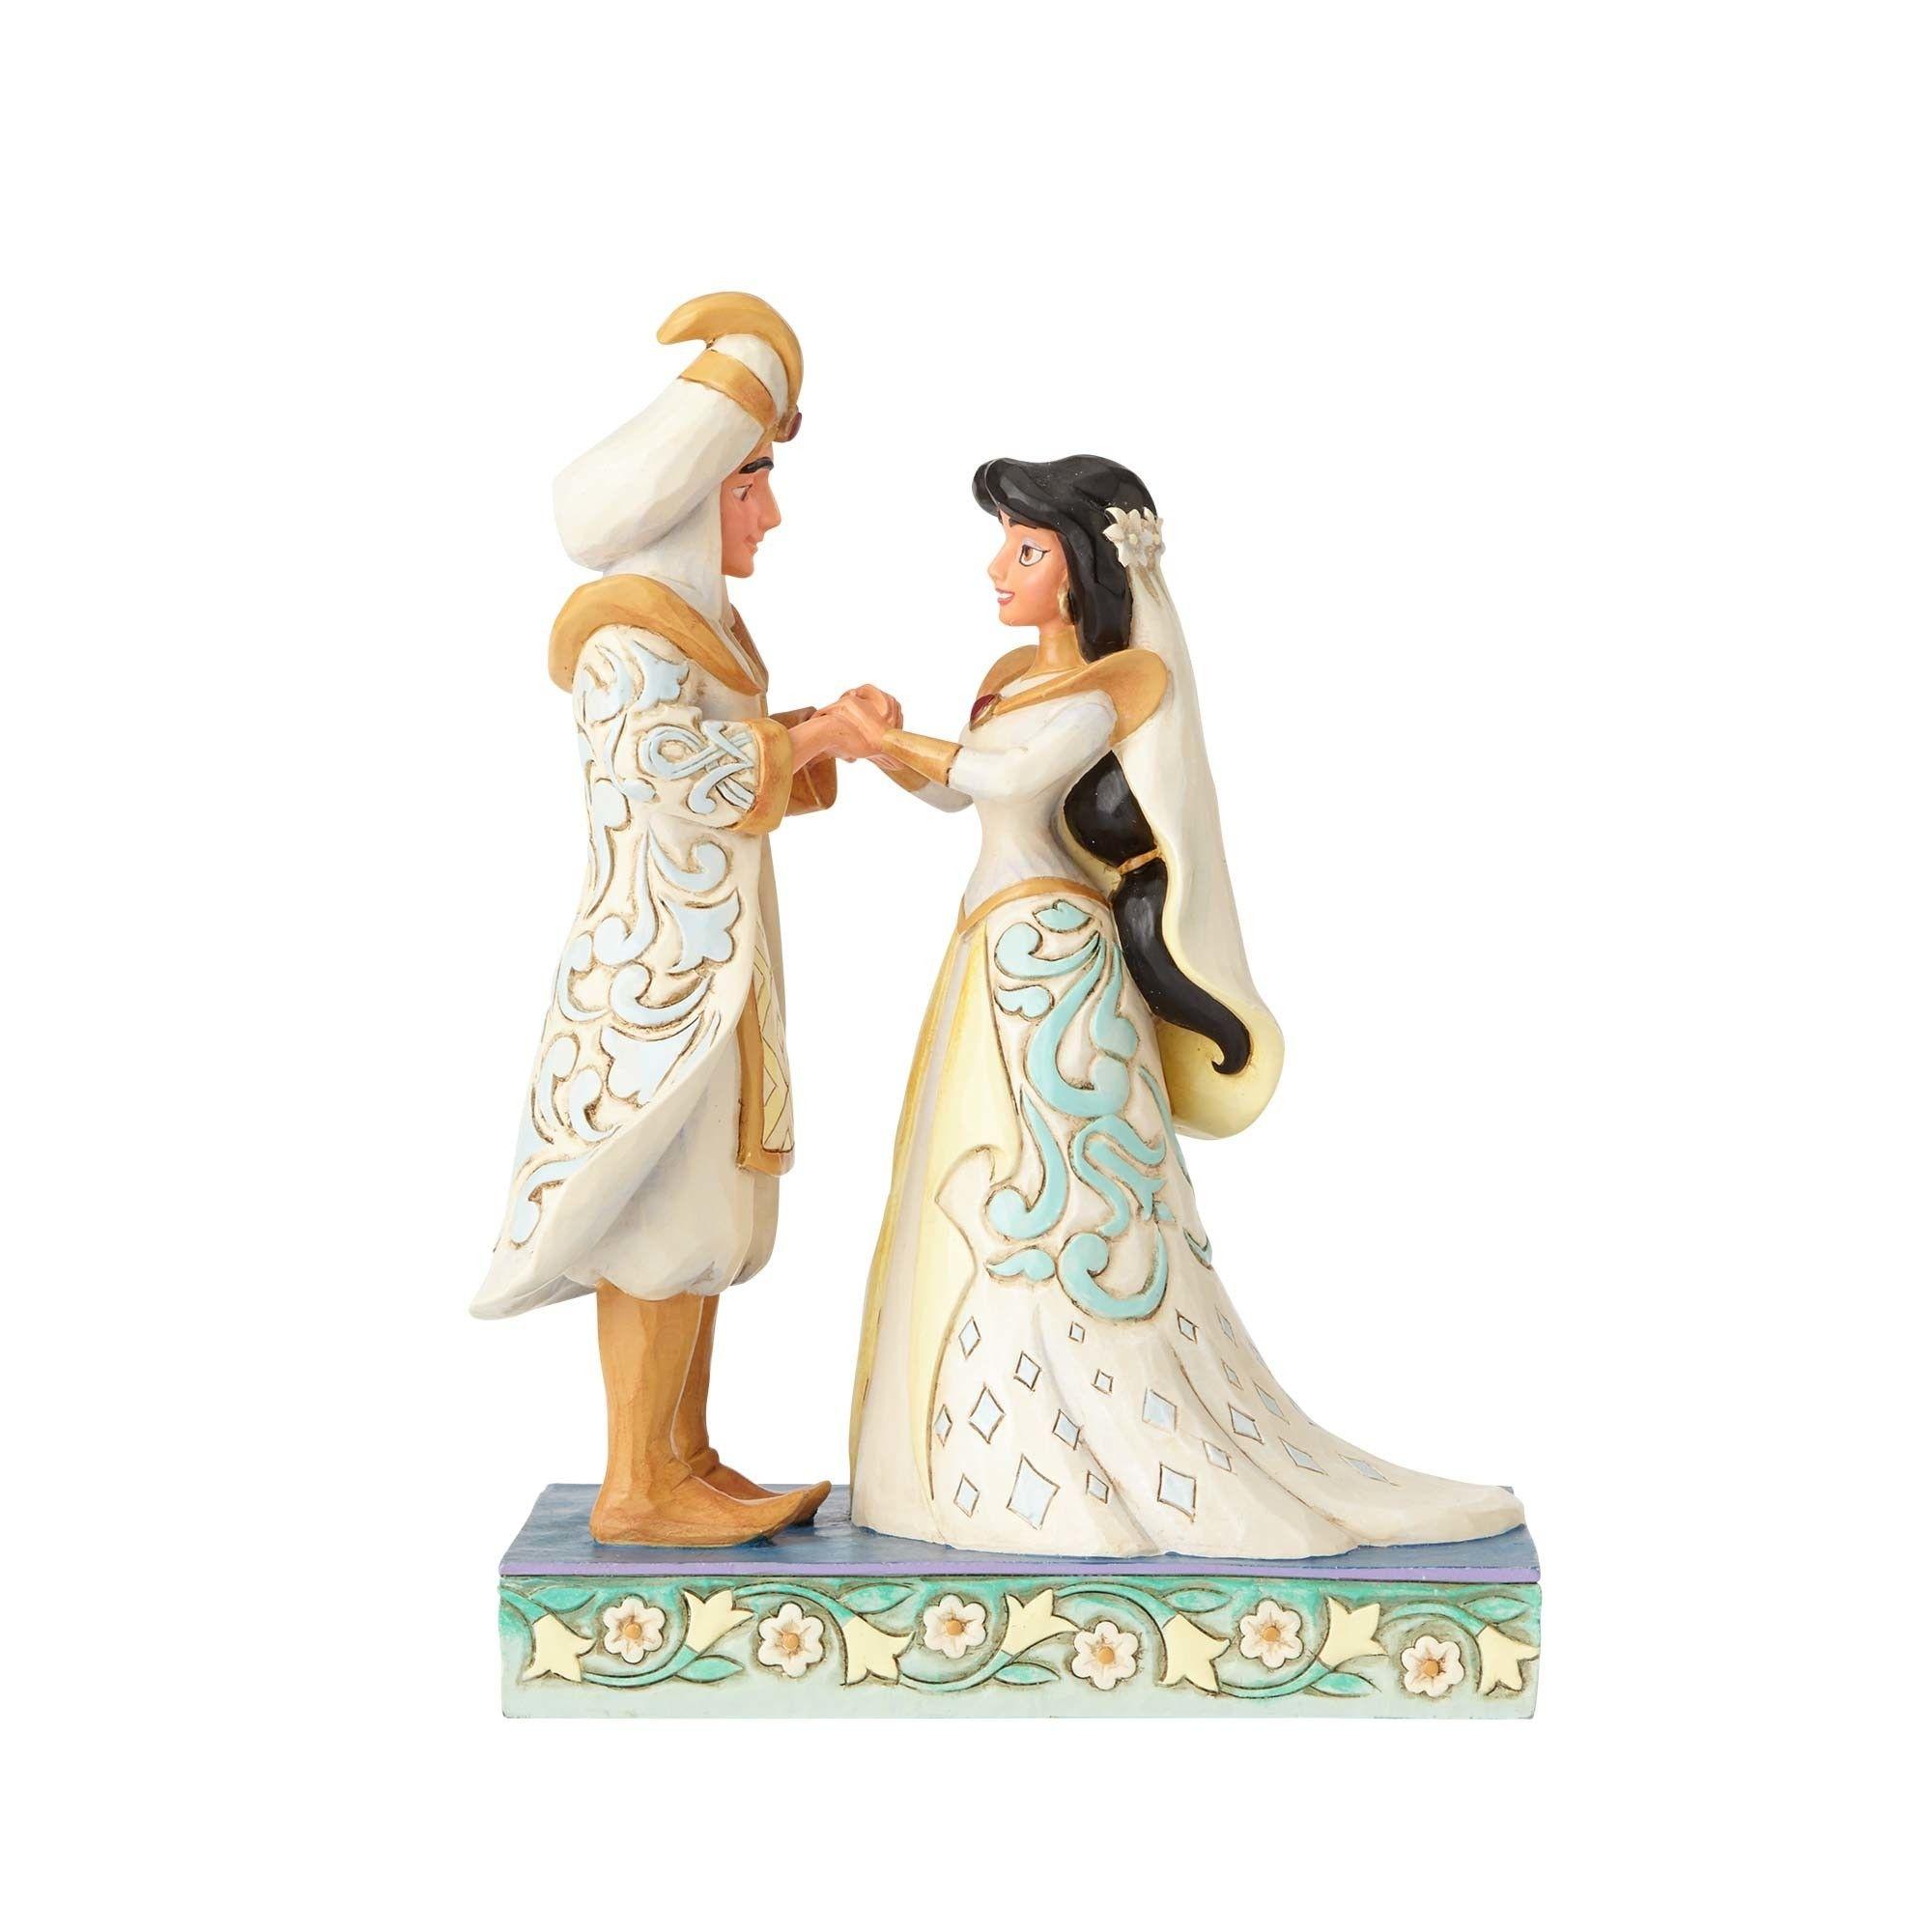 Pin By Deidre Burleson On Disney Disney Statues Aladdin Wedding Disney Traditions [ 2000 x 2000 Pixel ]